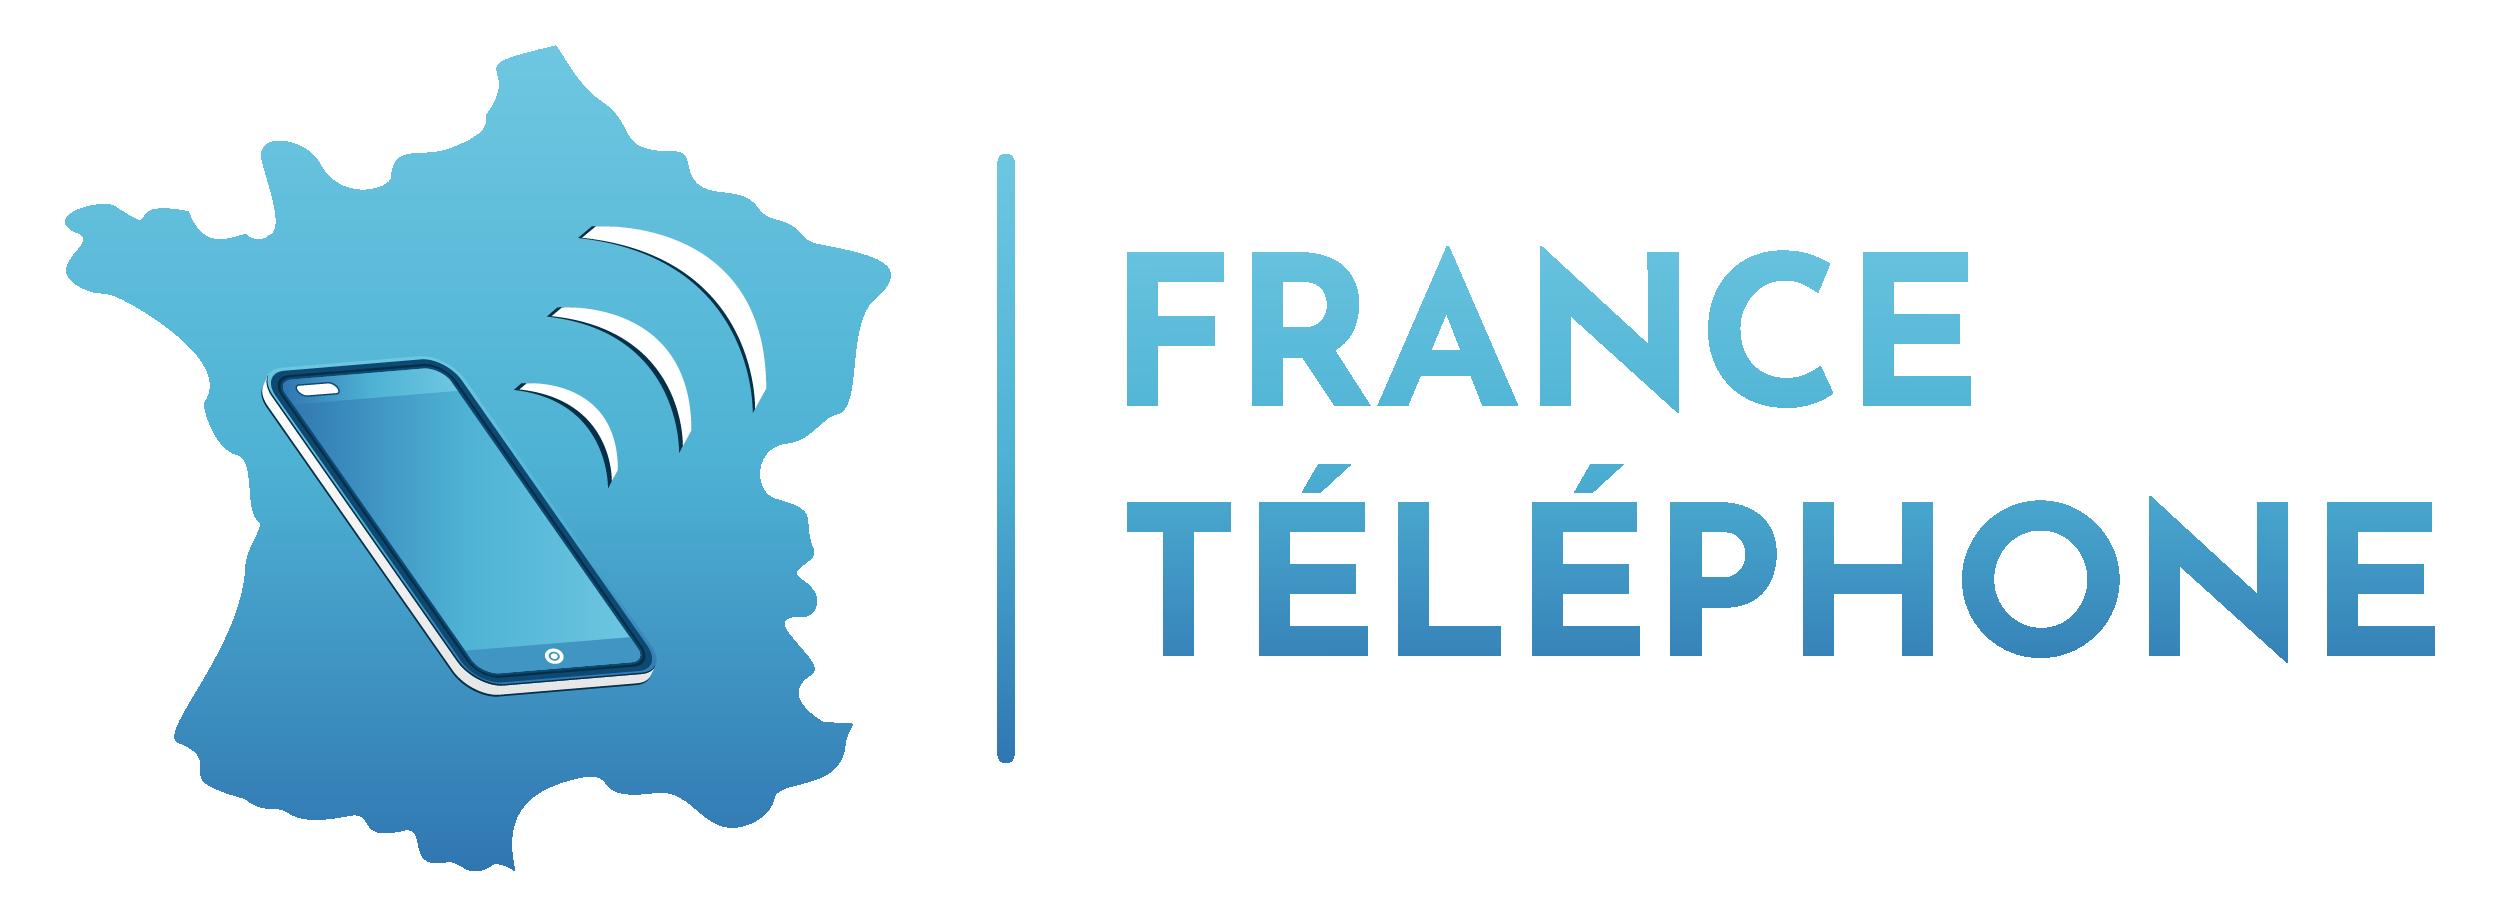 France Telephone